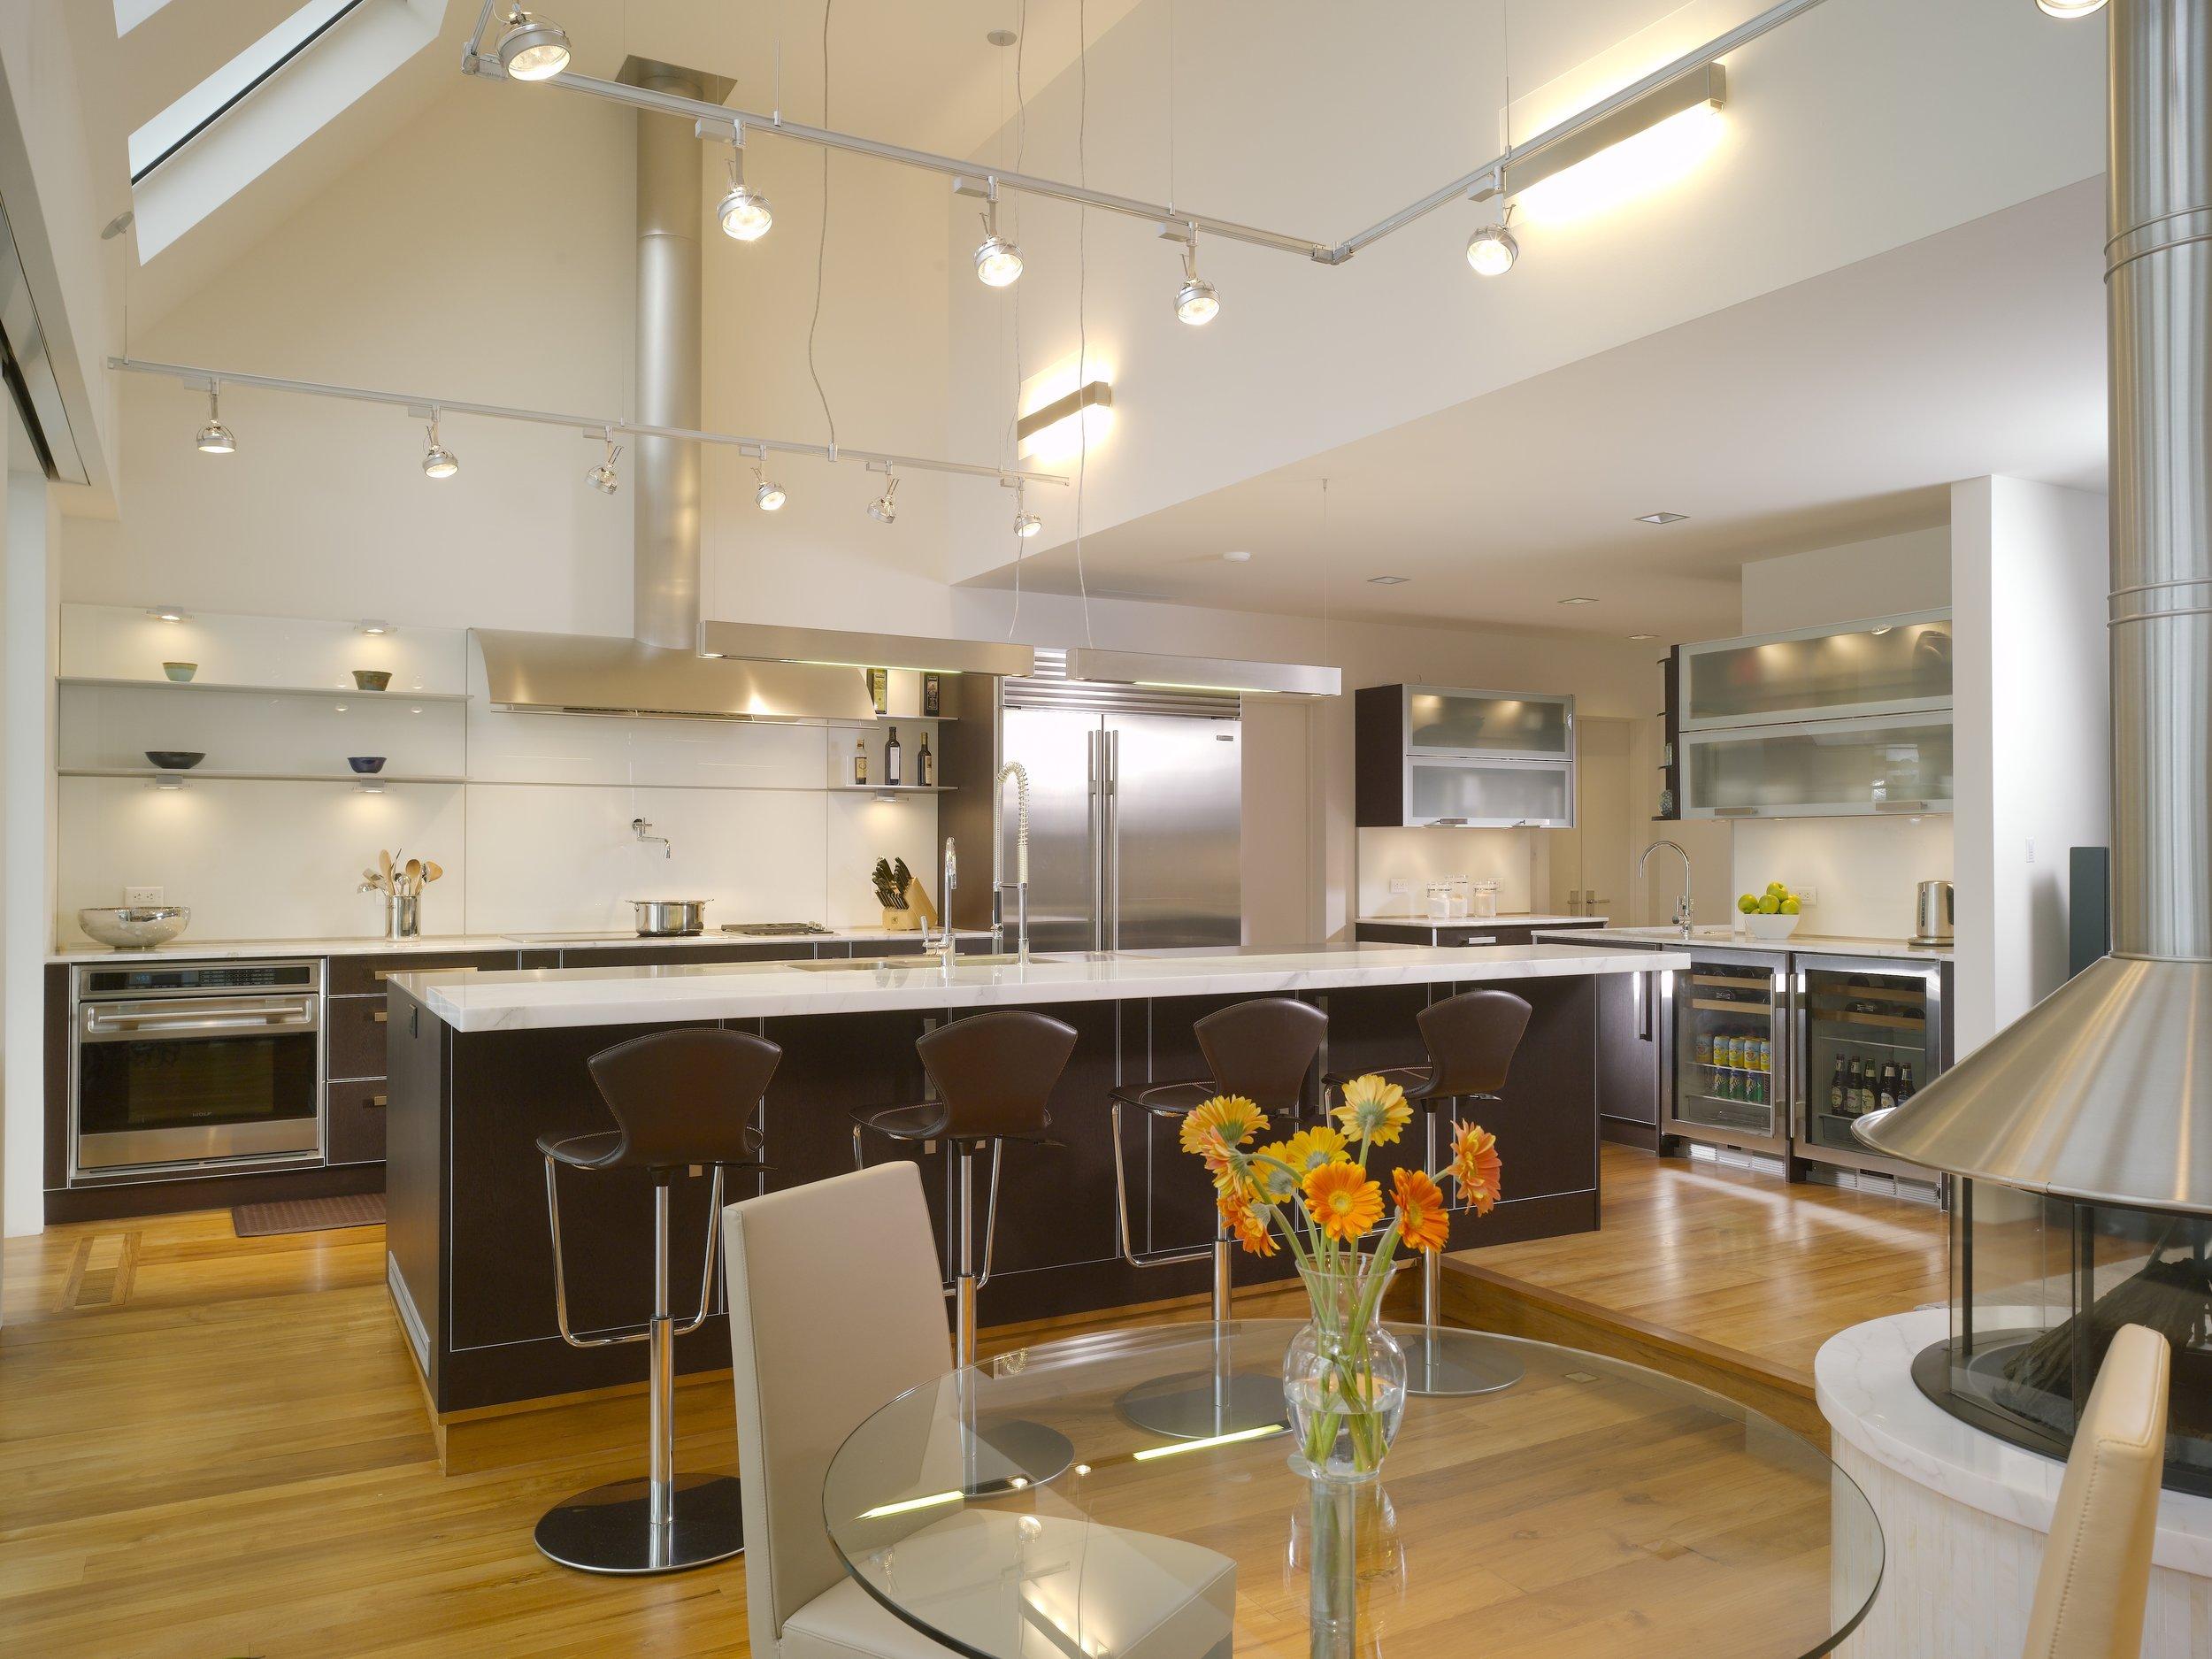 dining_kitchen copy.jpg